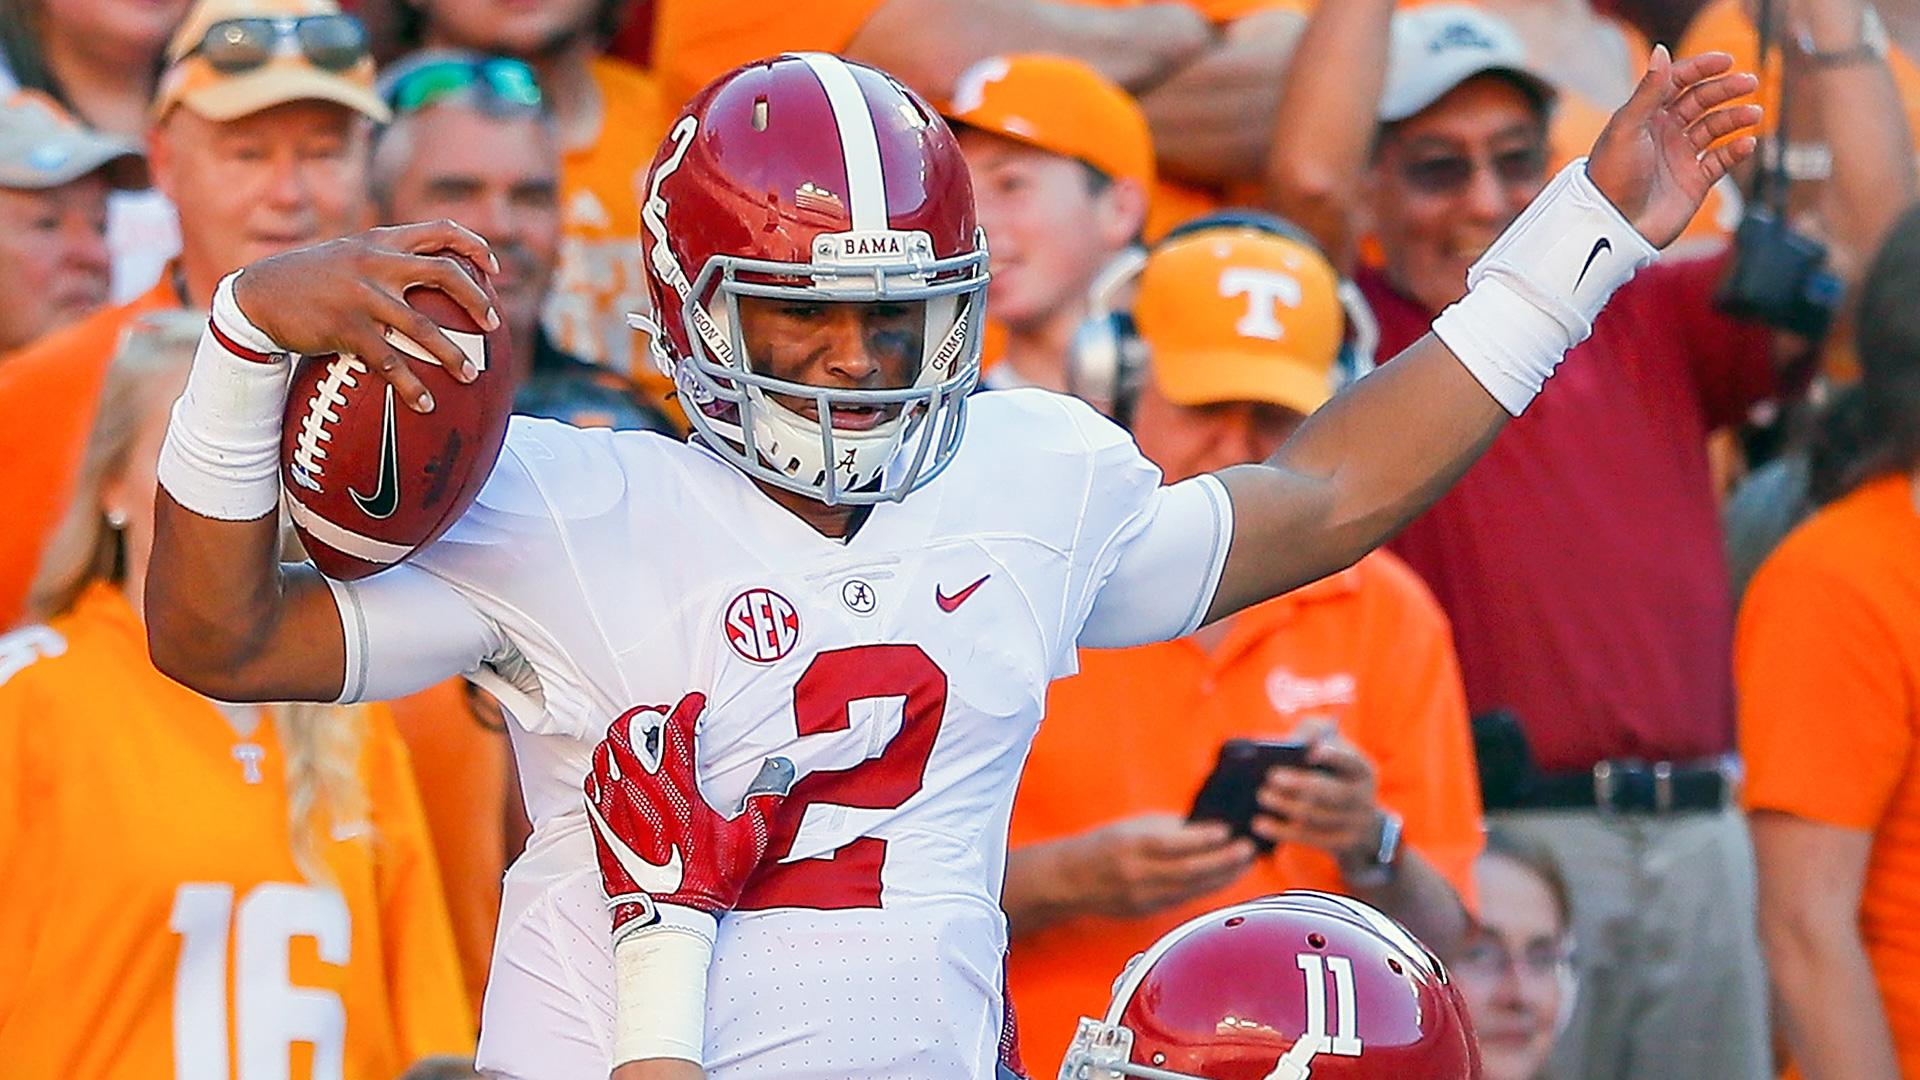 Alabama t-freshman QB Jalen Hurts